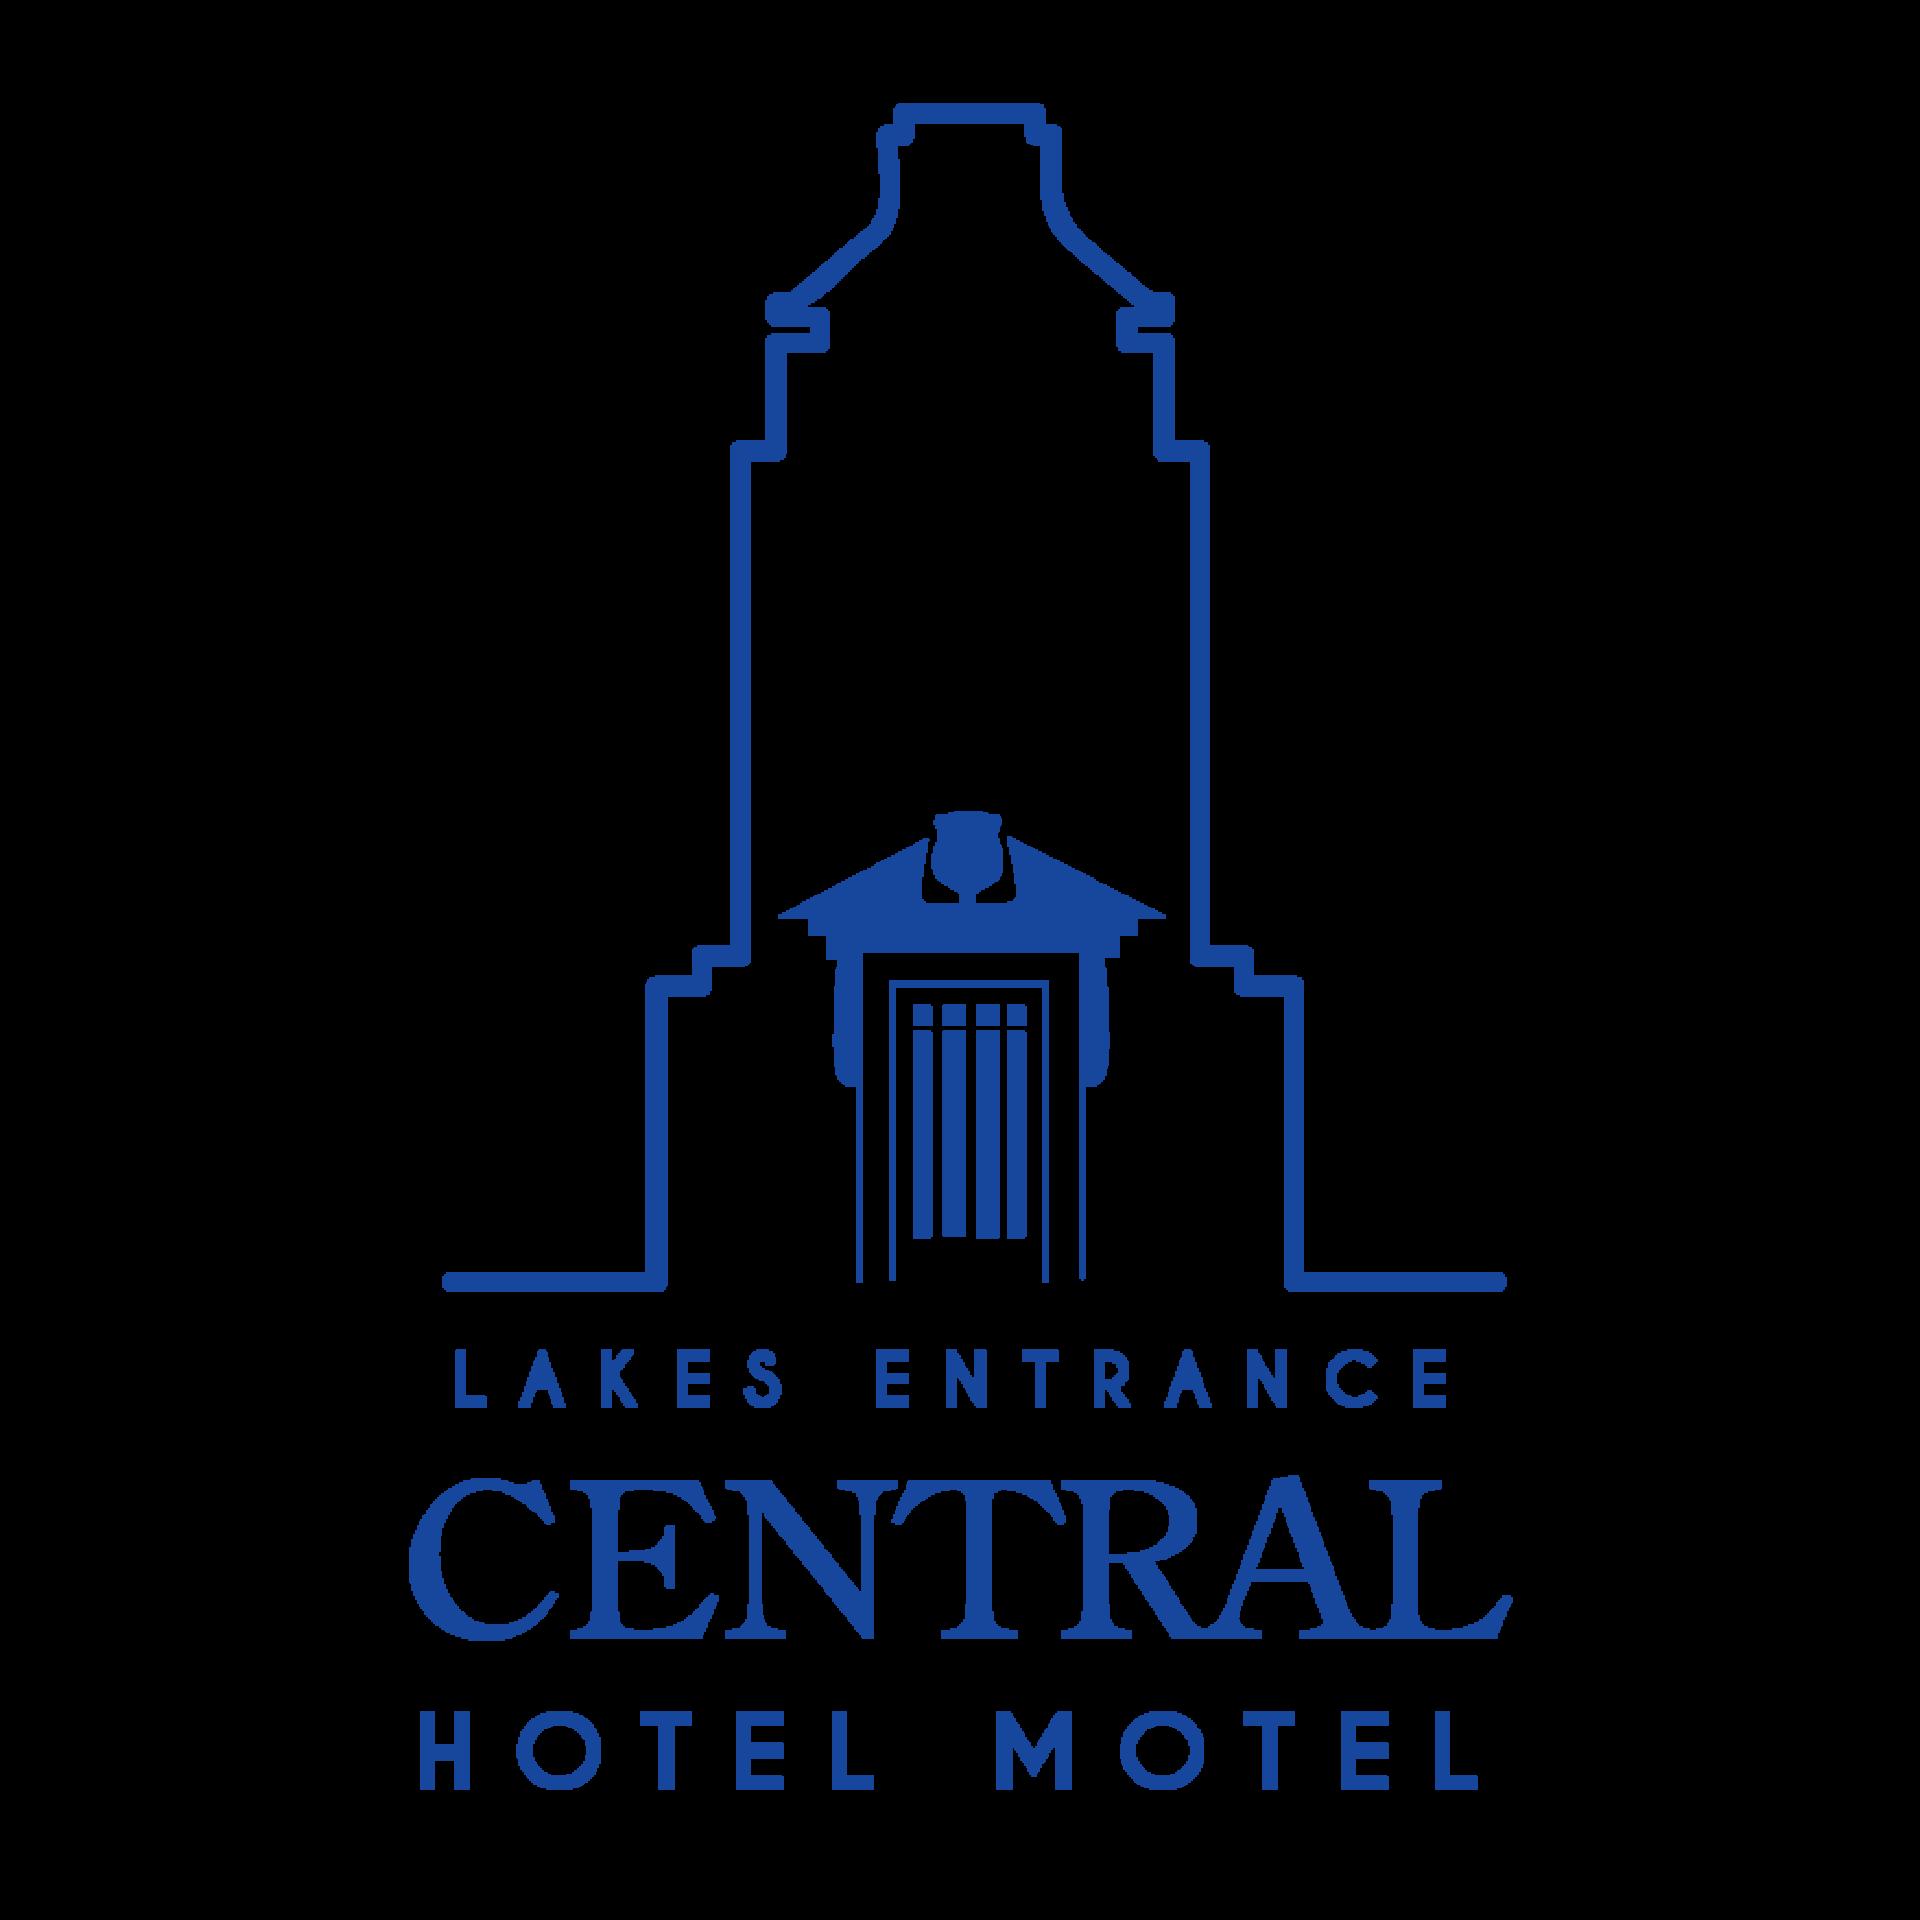 Central Hotel Motel Lakes Entrance